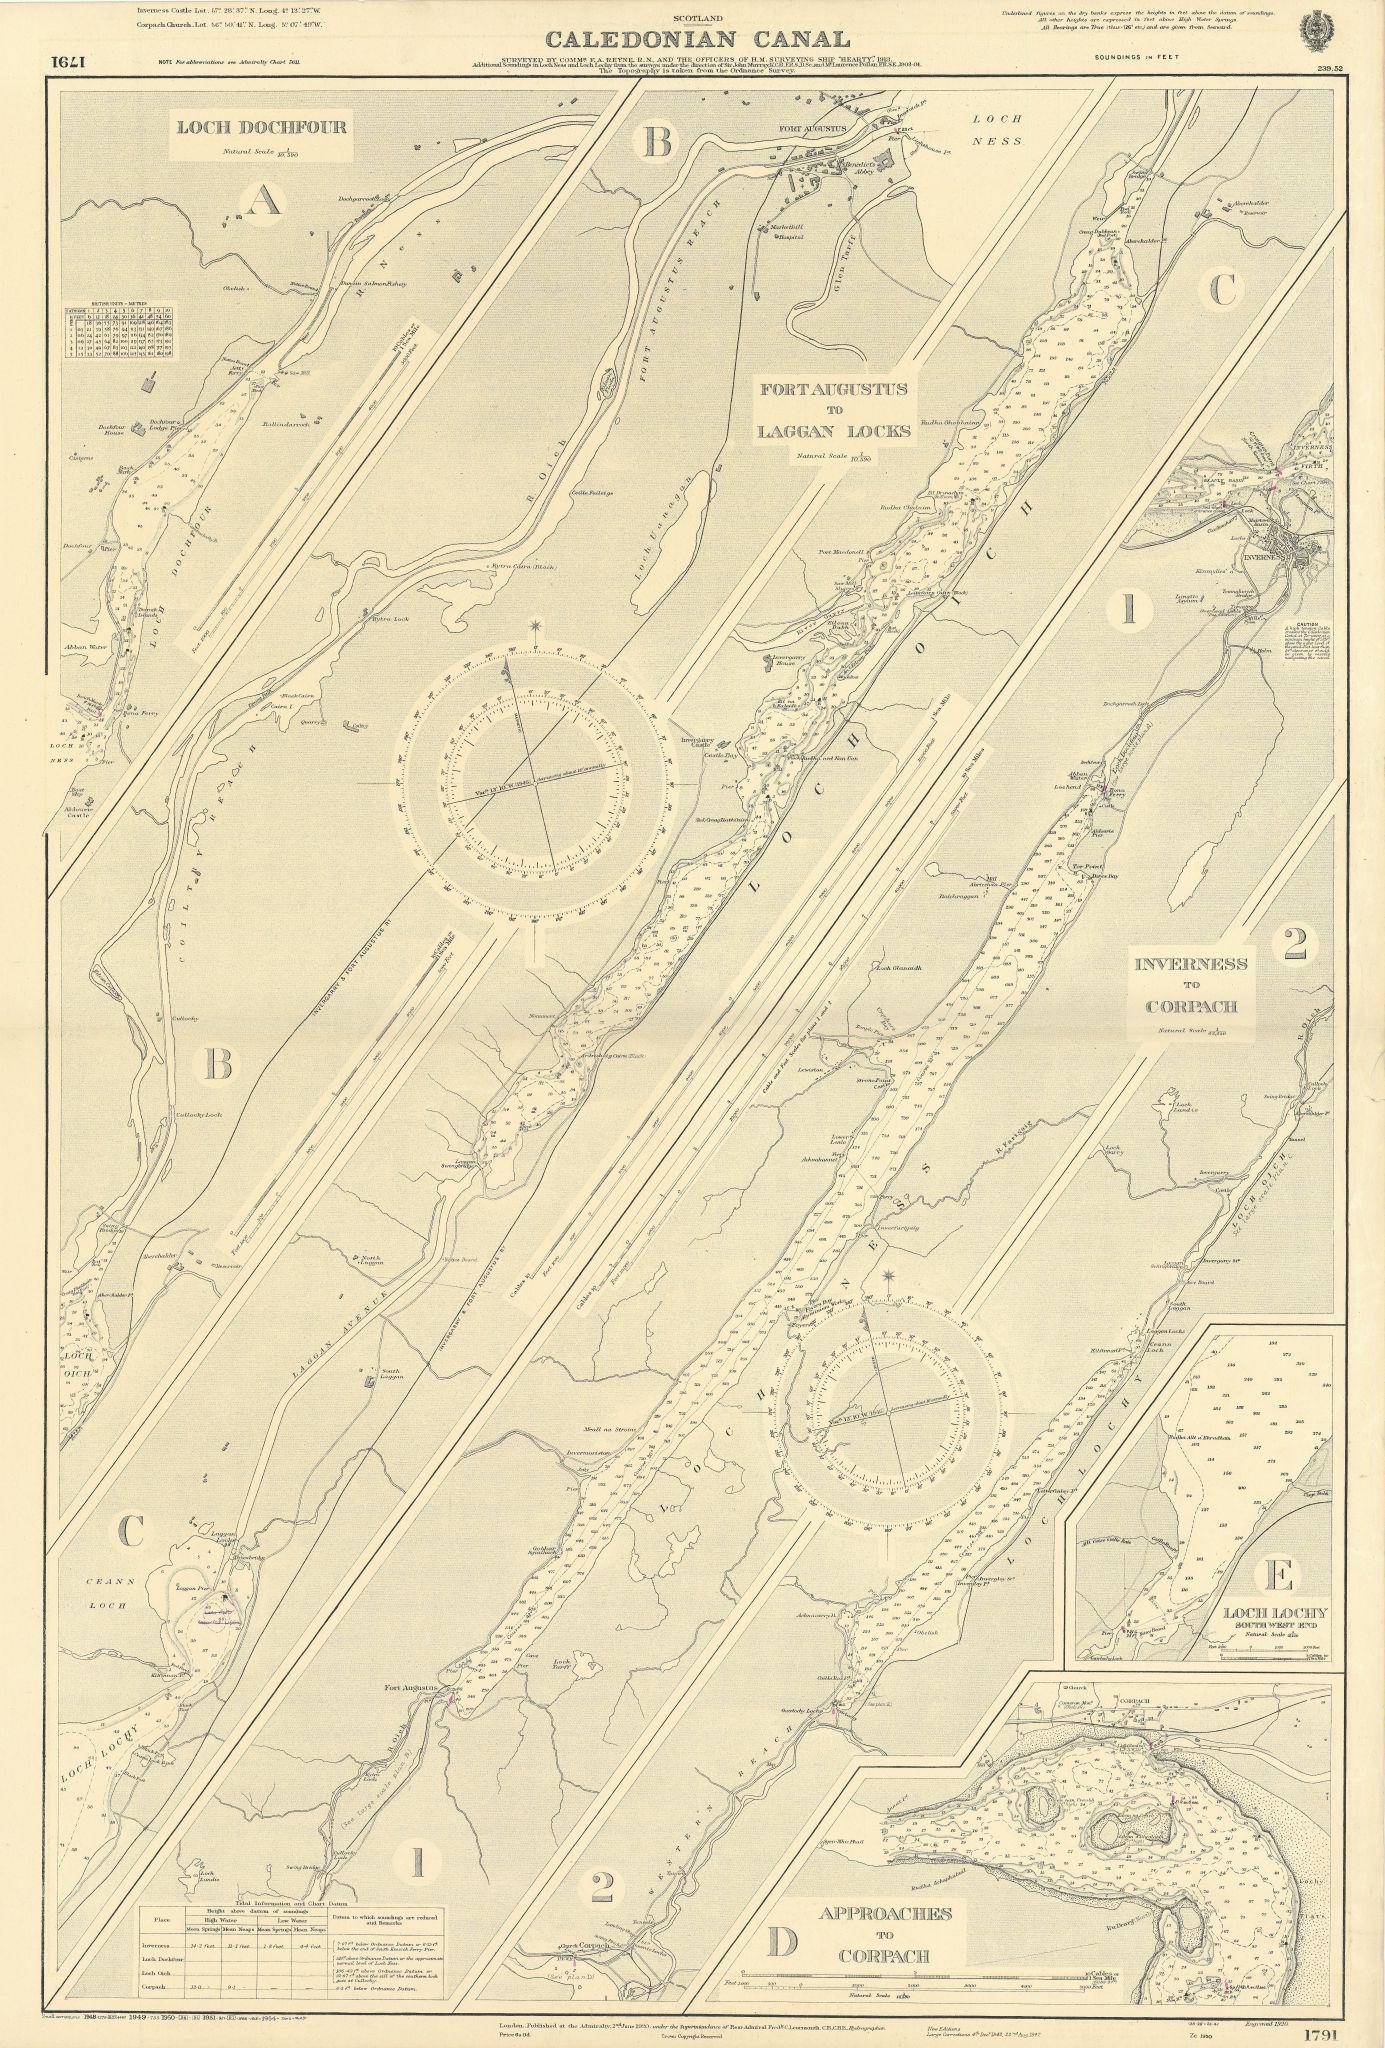 Caledonian Canal Scotland Dochfour Lochy Ness ADMIRALTY chart 1920 (1954) map